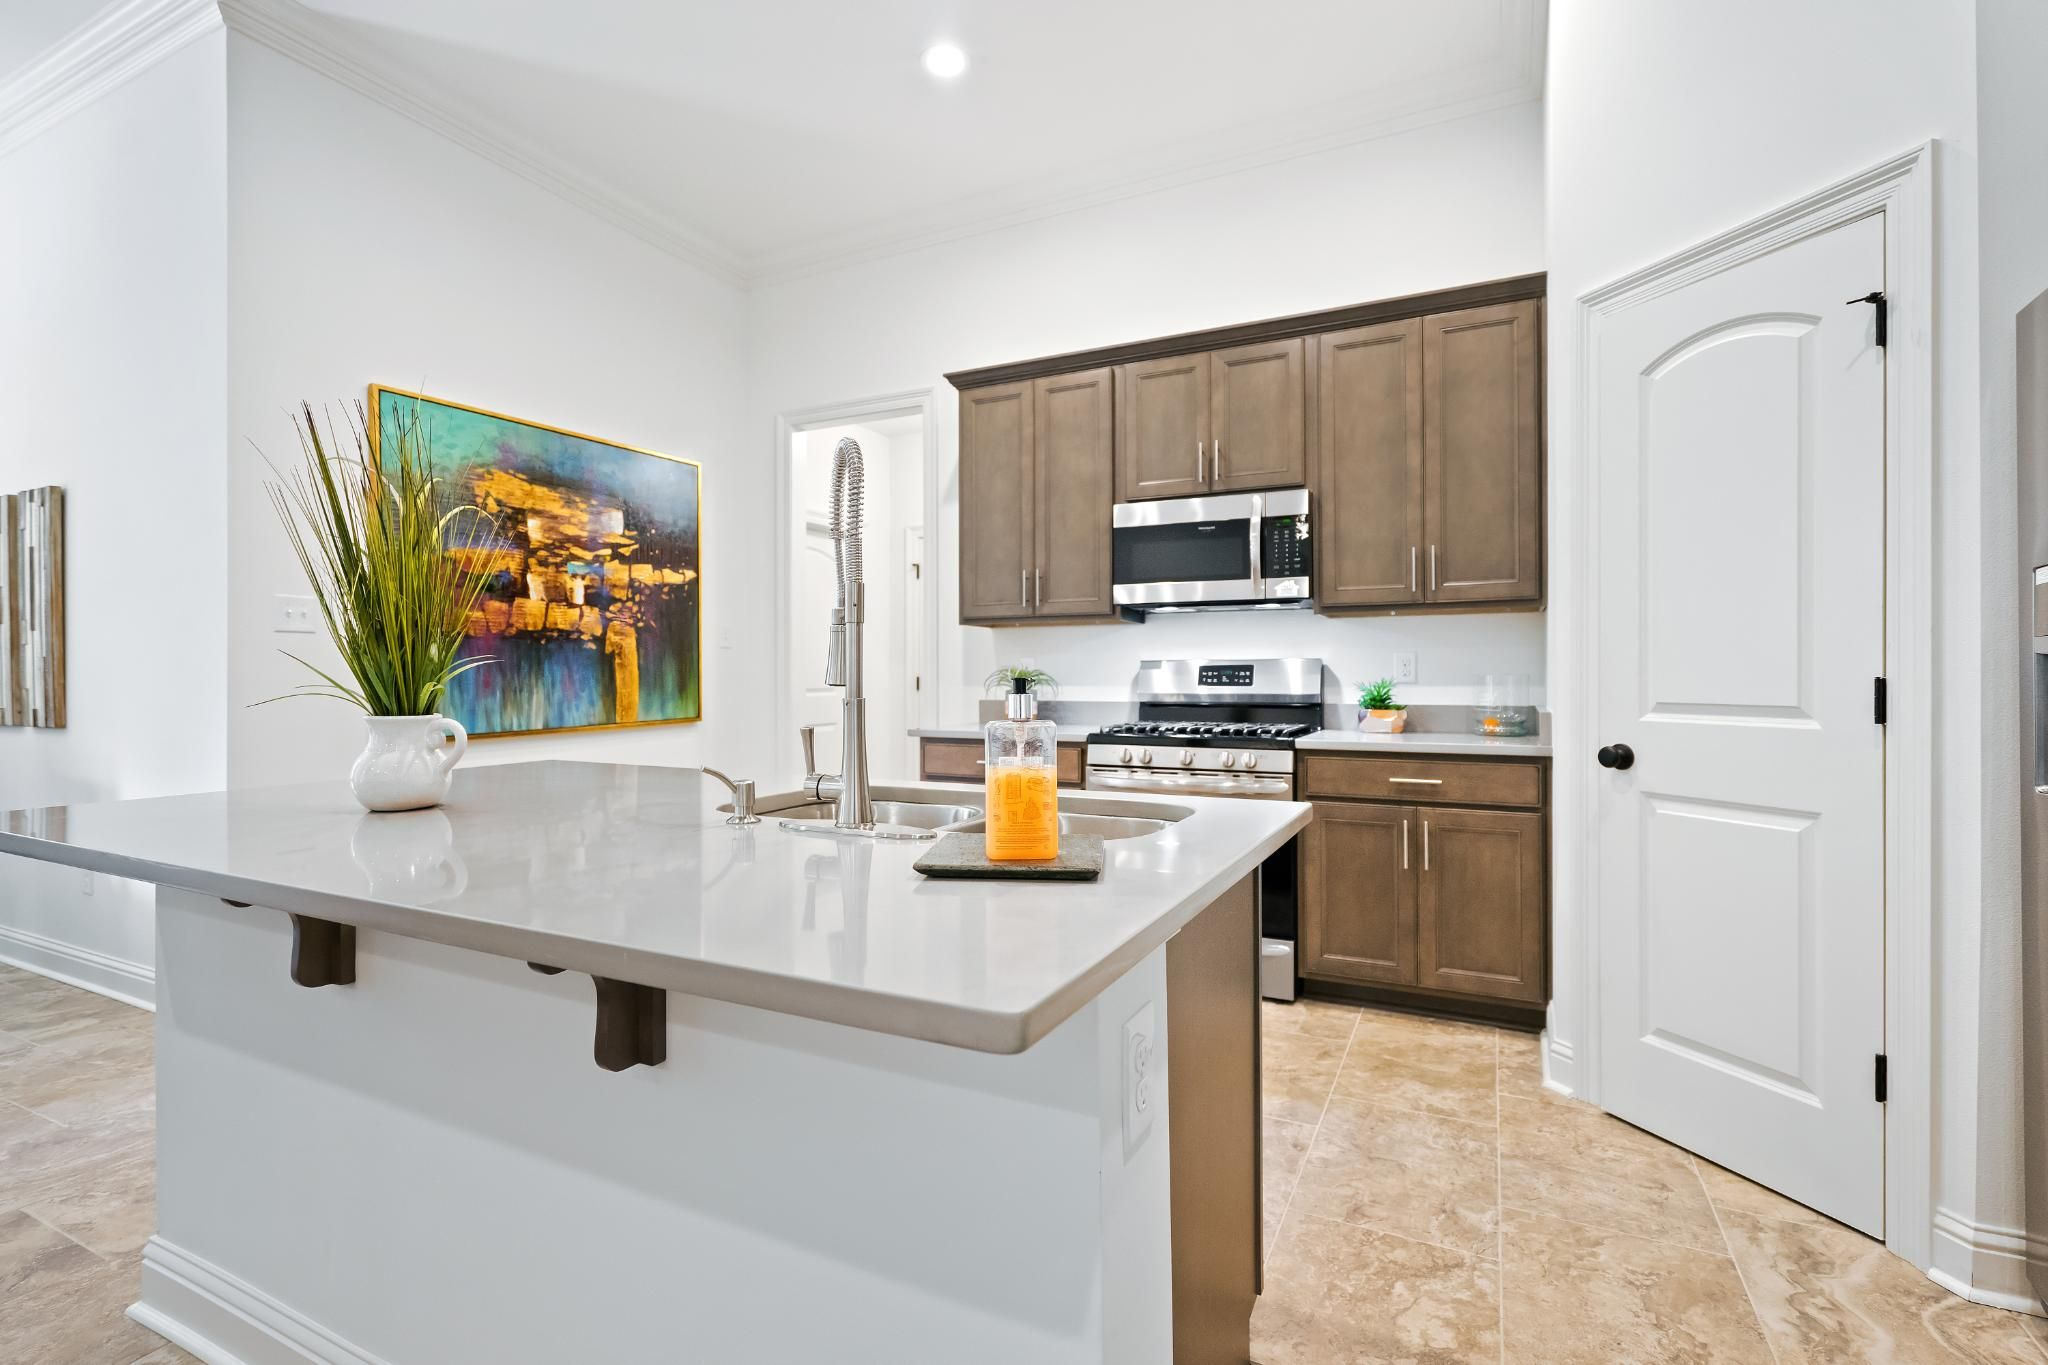 jackson court model home  reims iv a floor plan  new